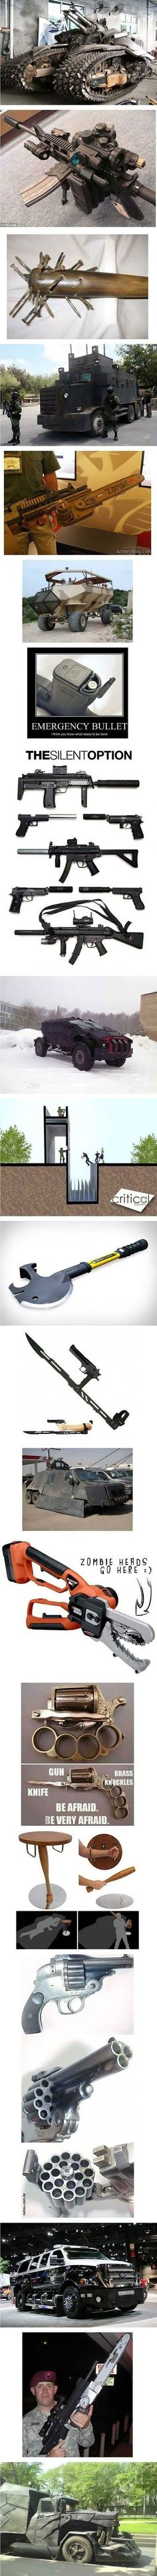 Supplies for the zombie apocalypse.